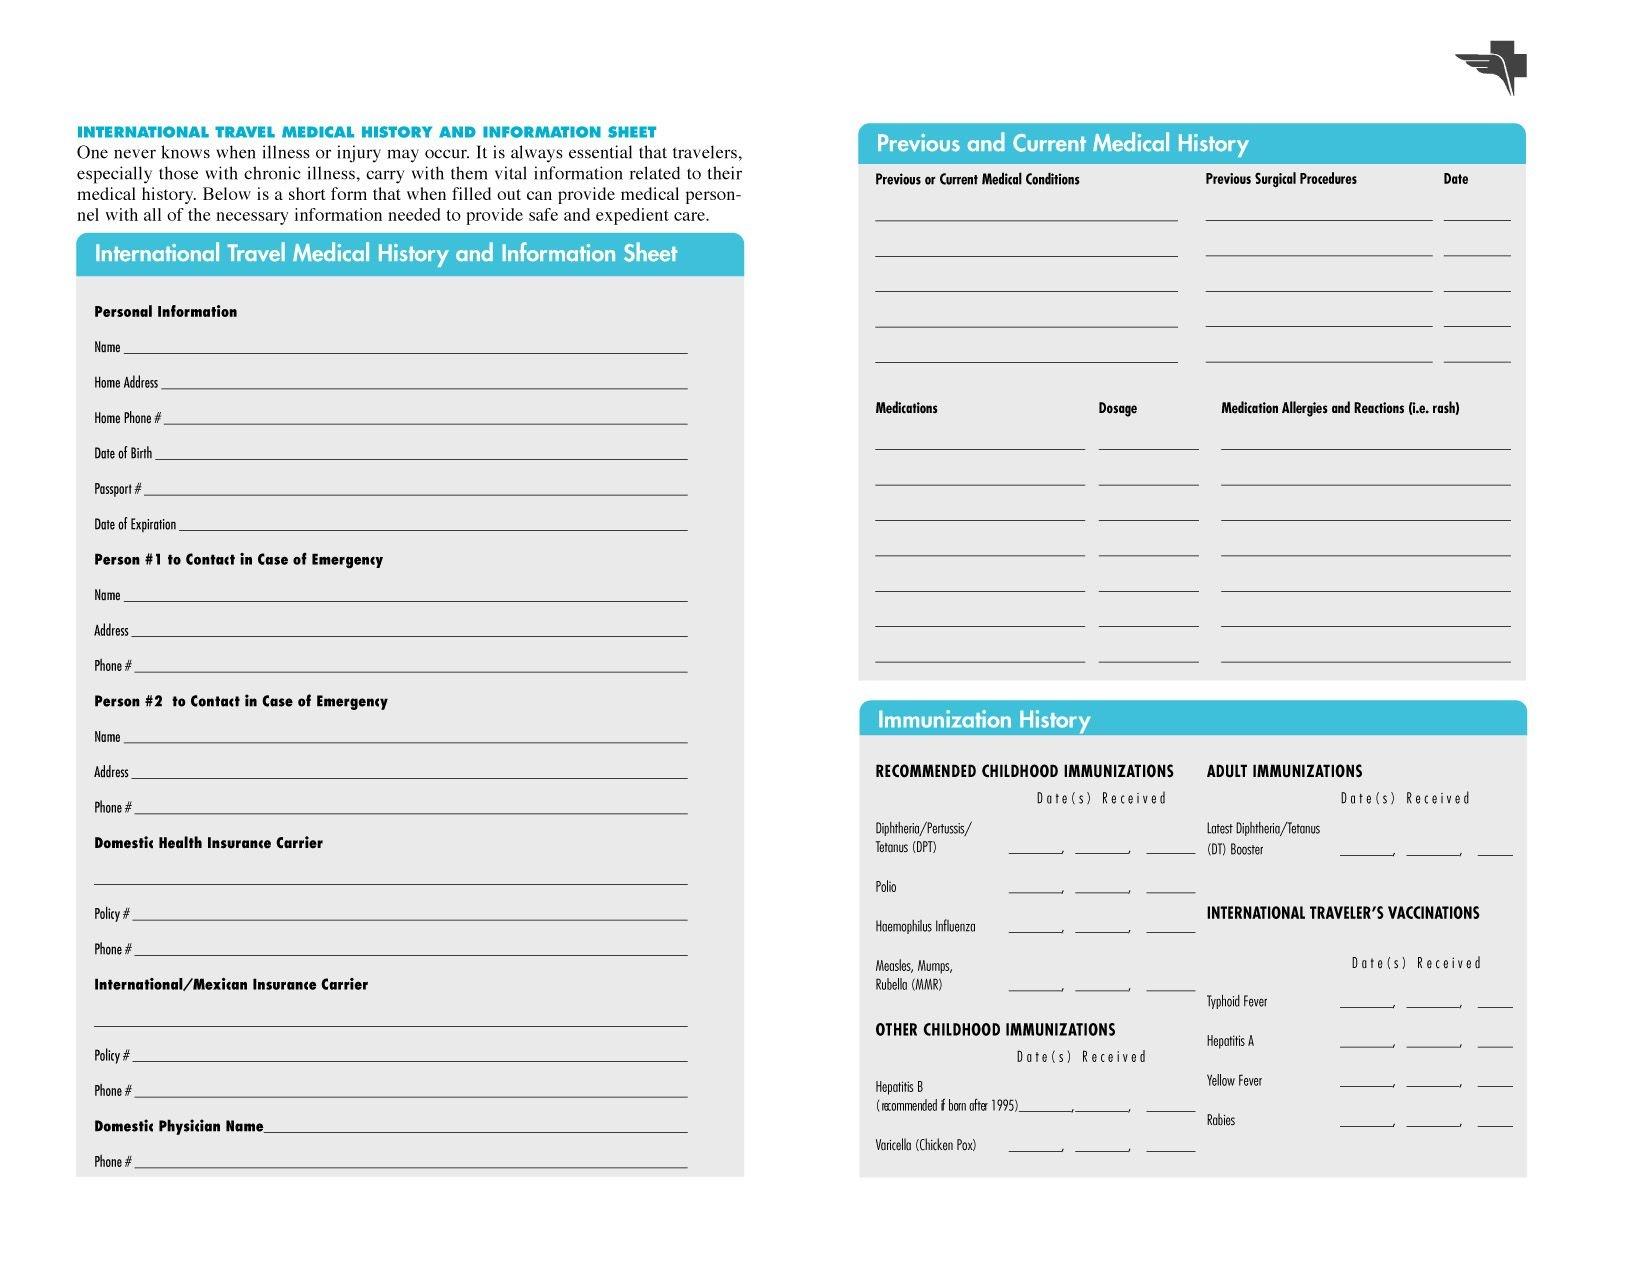 Free Printables   Free Printable Family Medical History Forms - Free Printable Medical Forms Kit